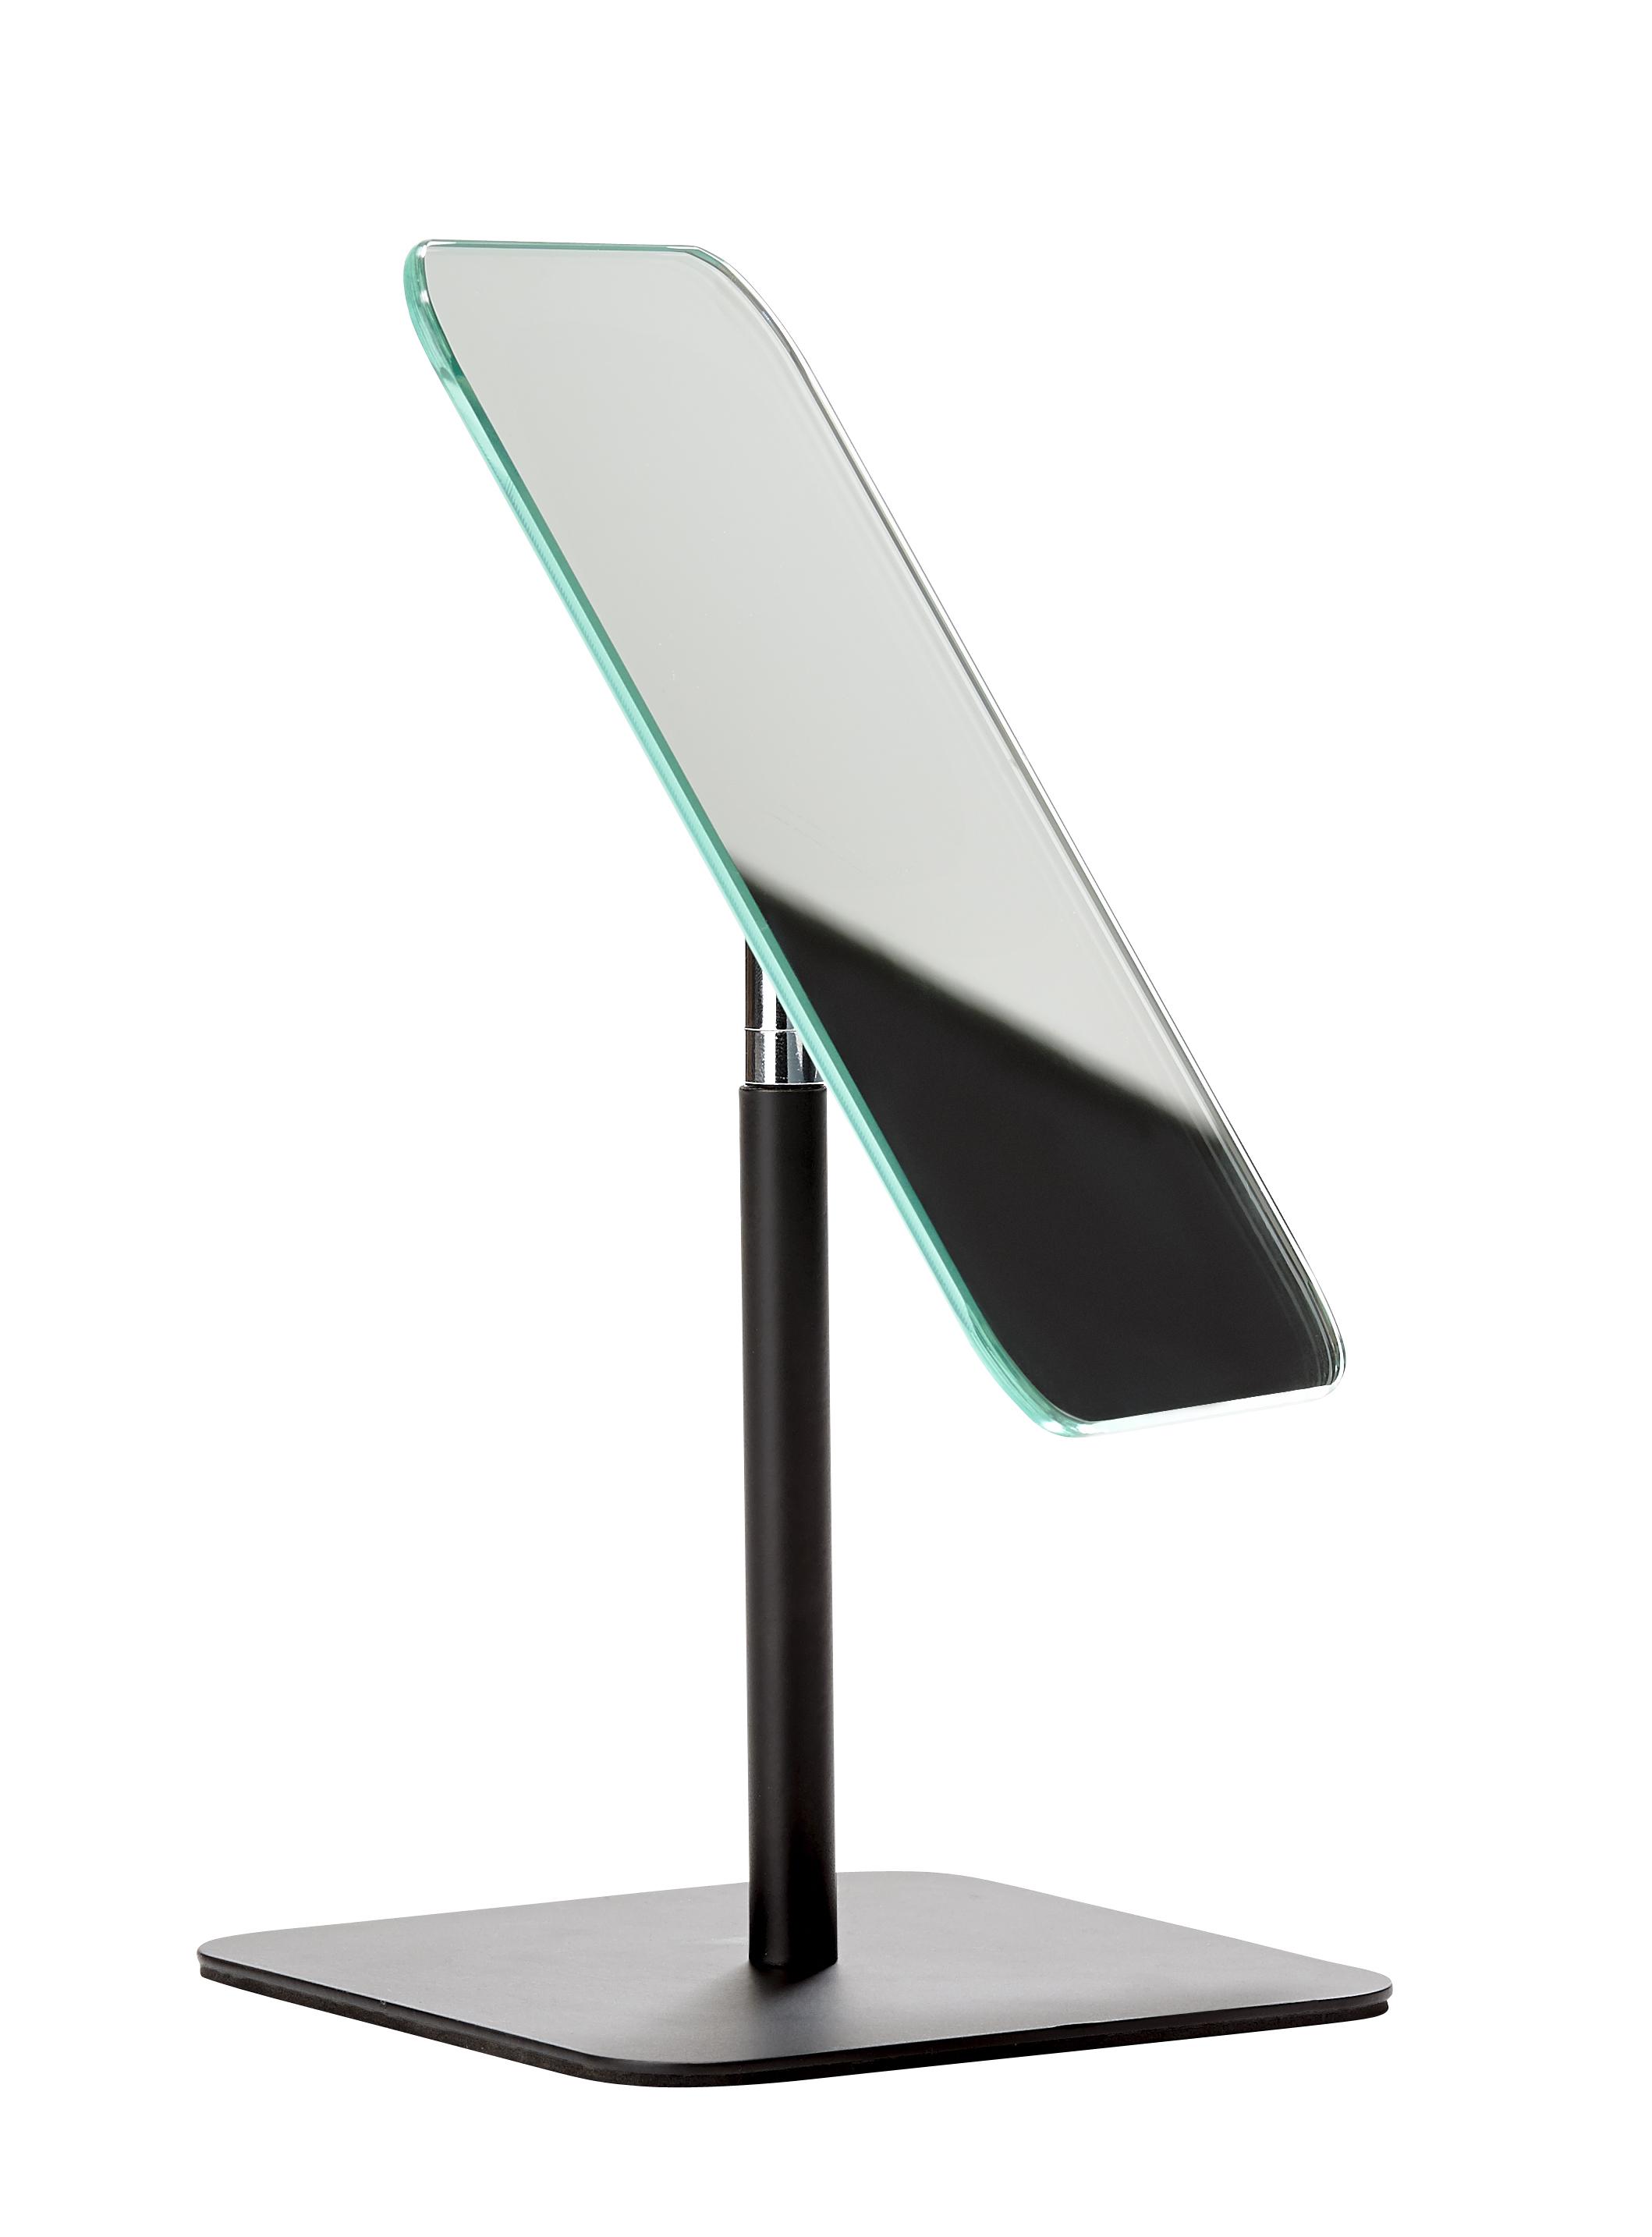 Bordsspegel Metall Svart 28,5x12,5 cm